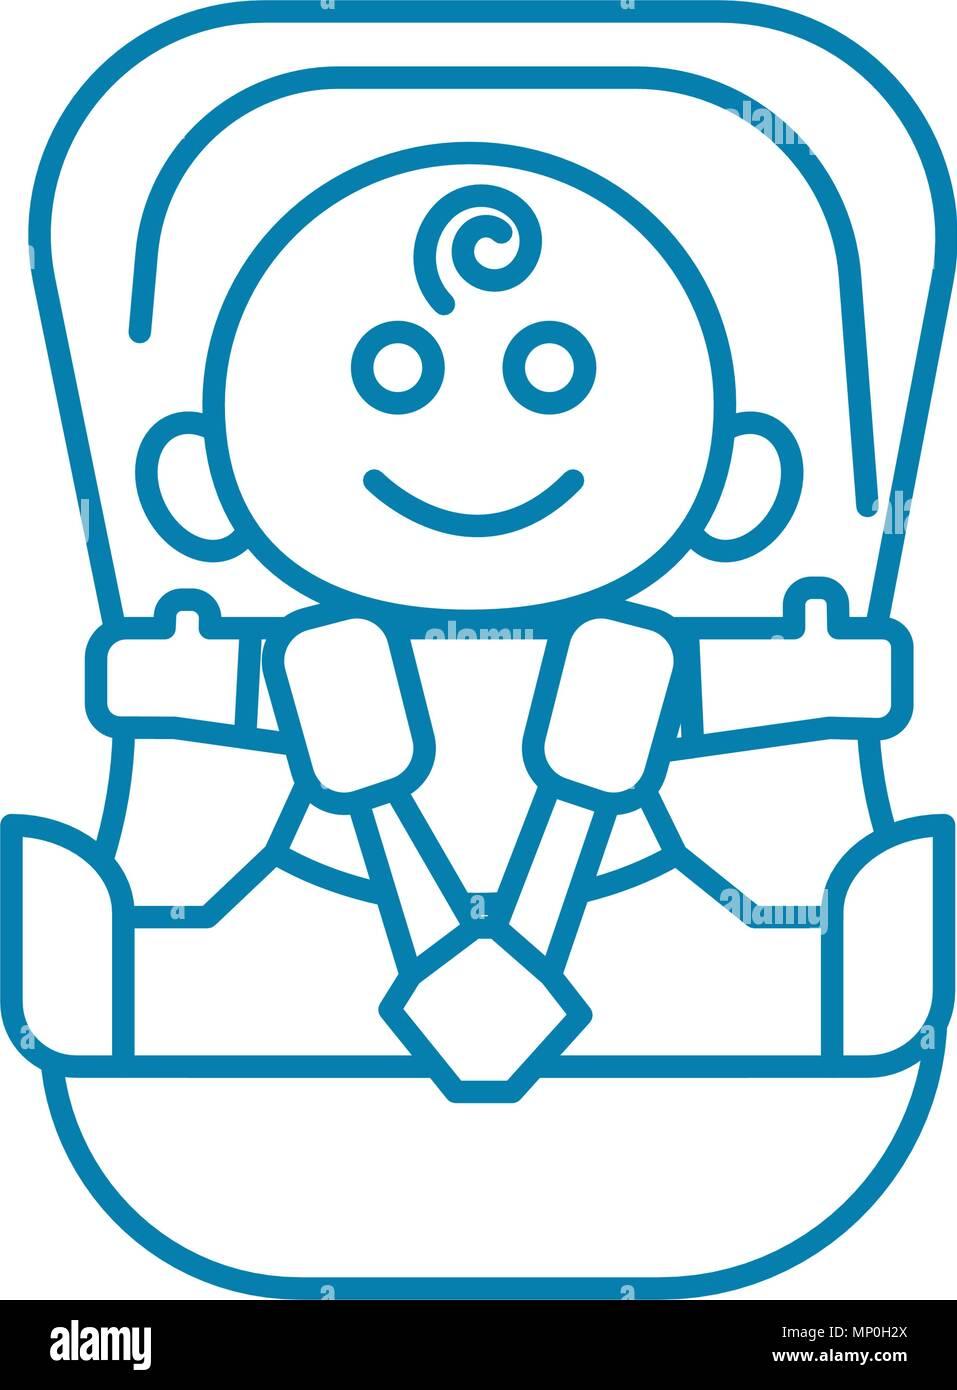 Child Car Seat Linear Icon Concept Line Vector Sign Symbol